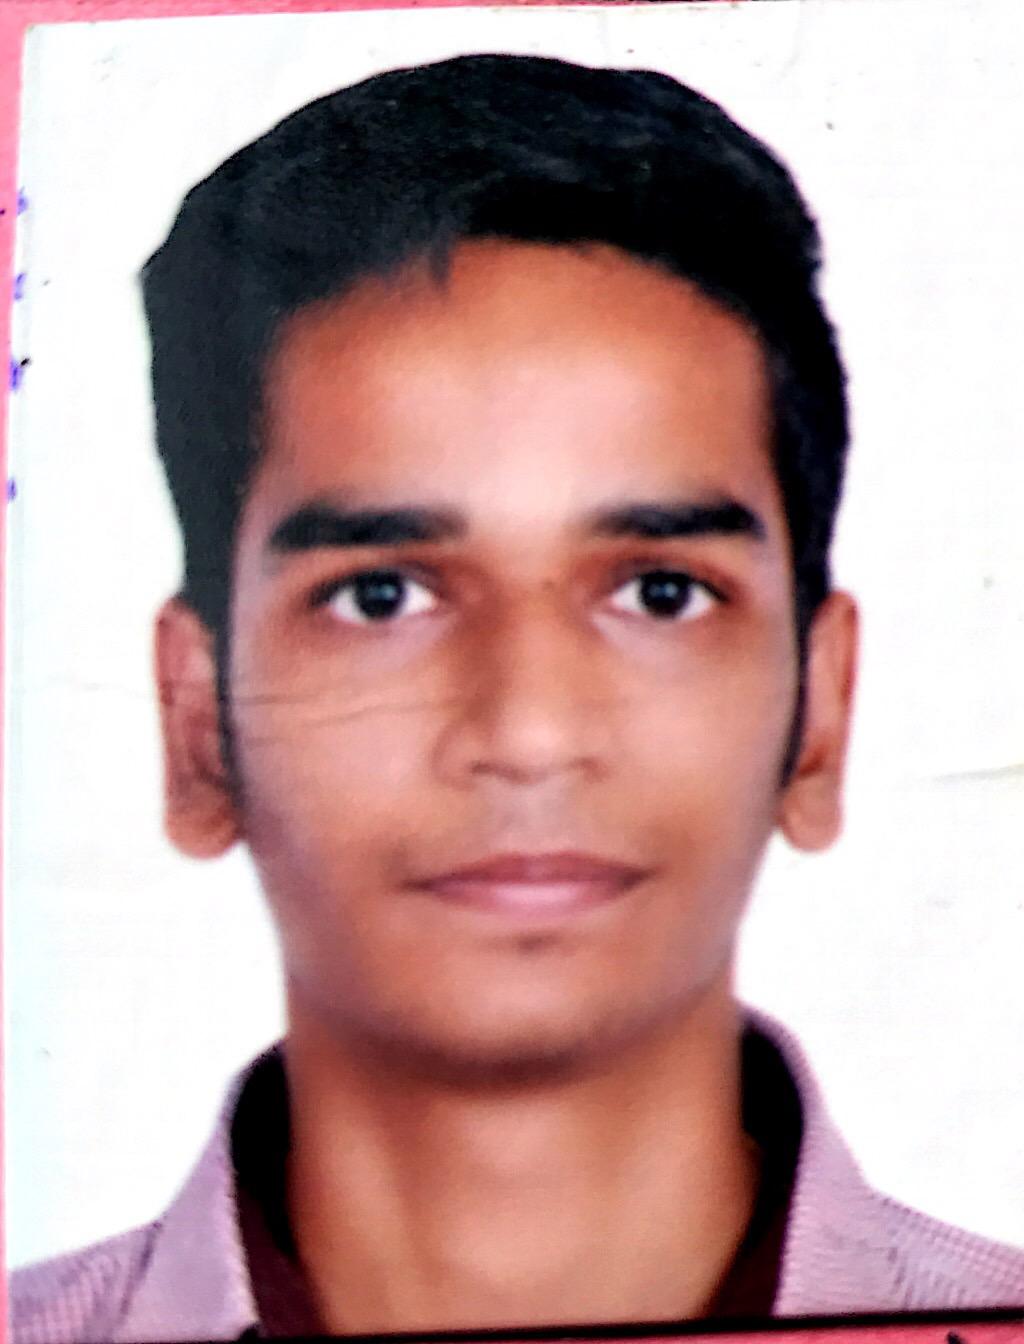 Mr. Jeet Mihirkumar Patel